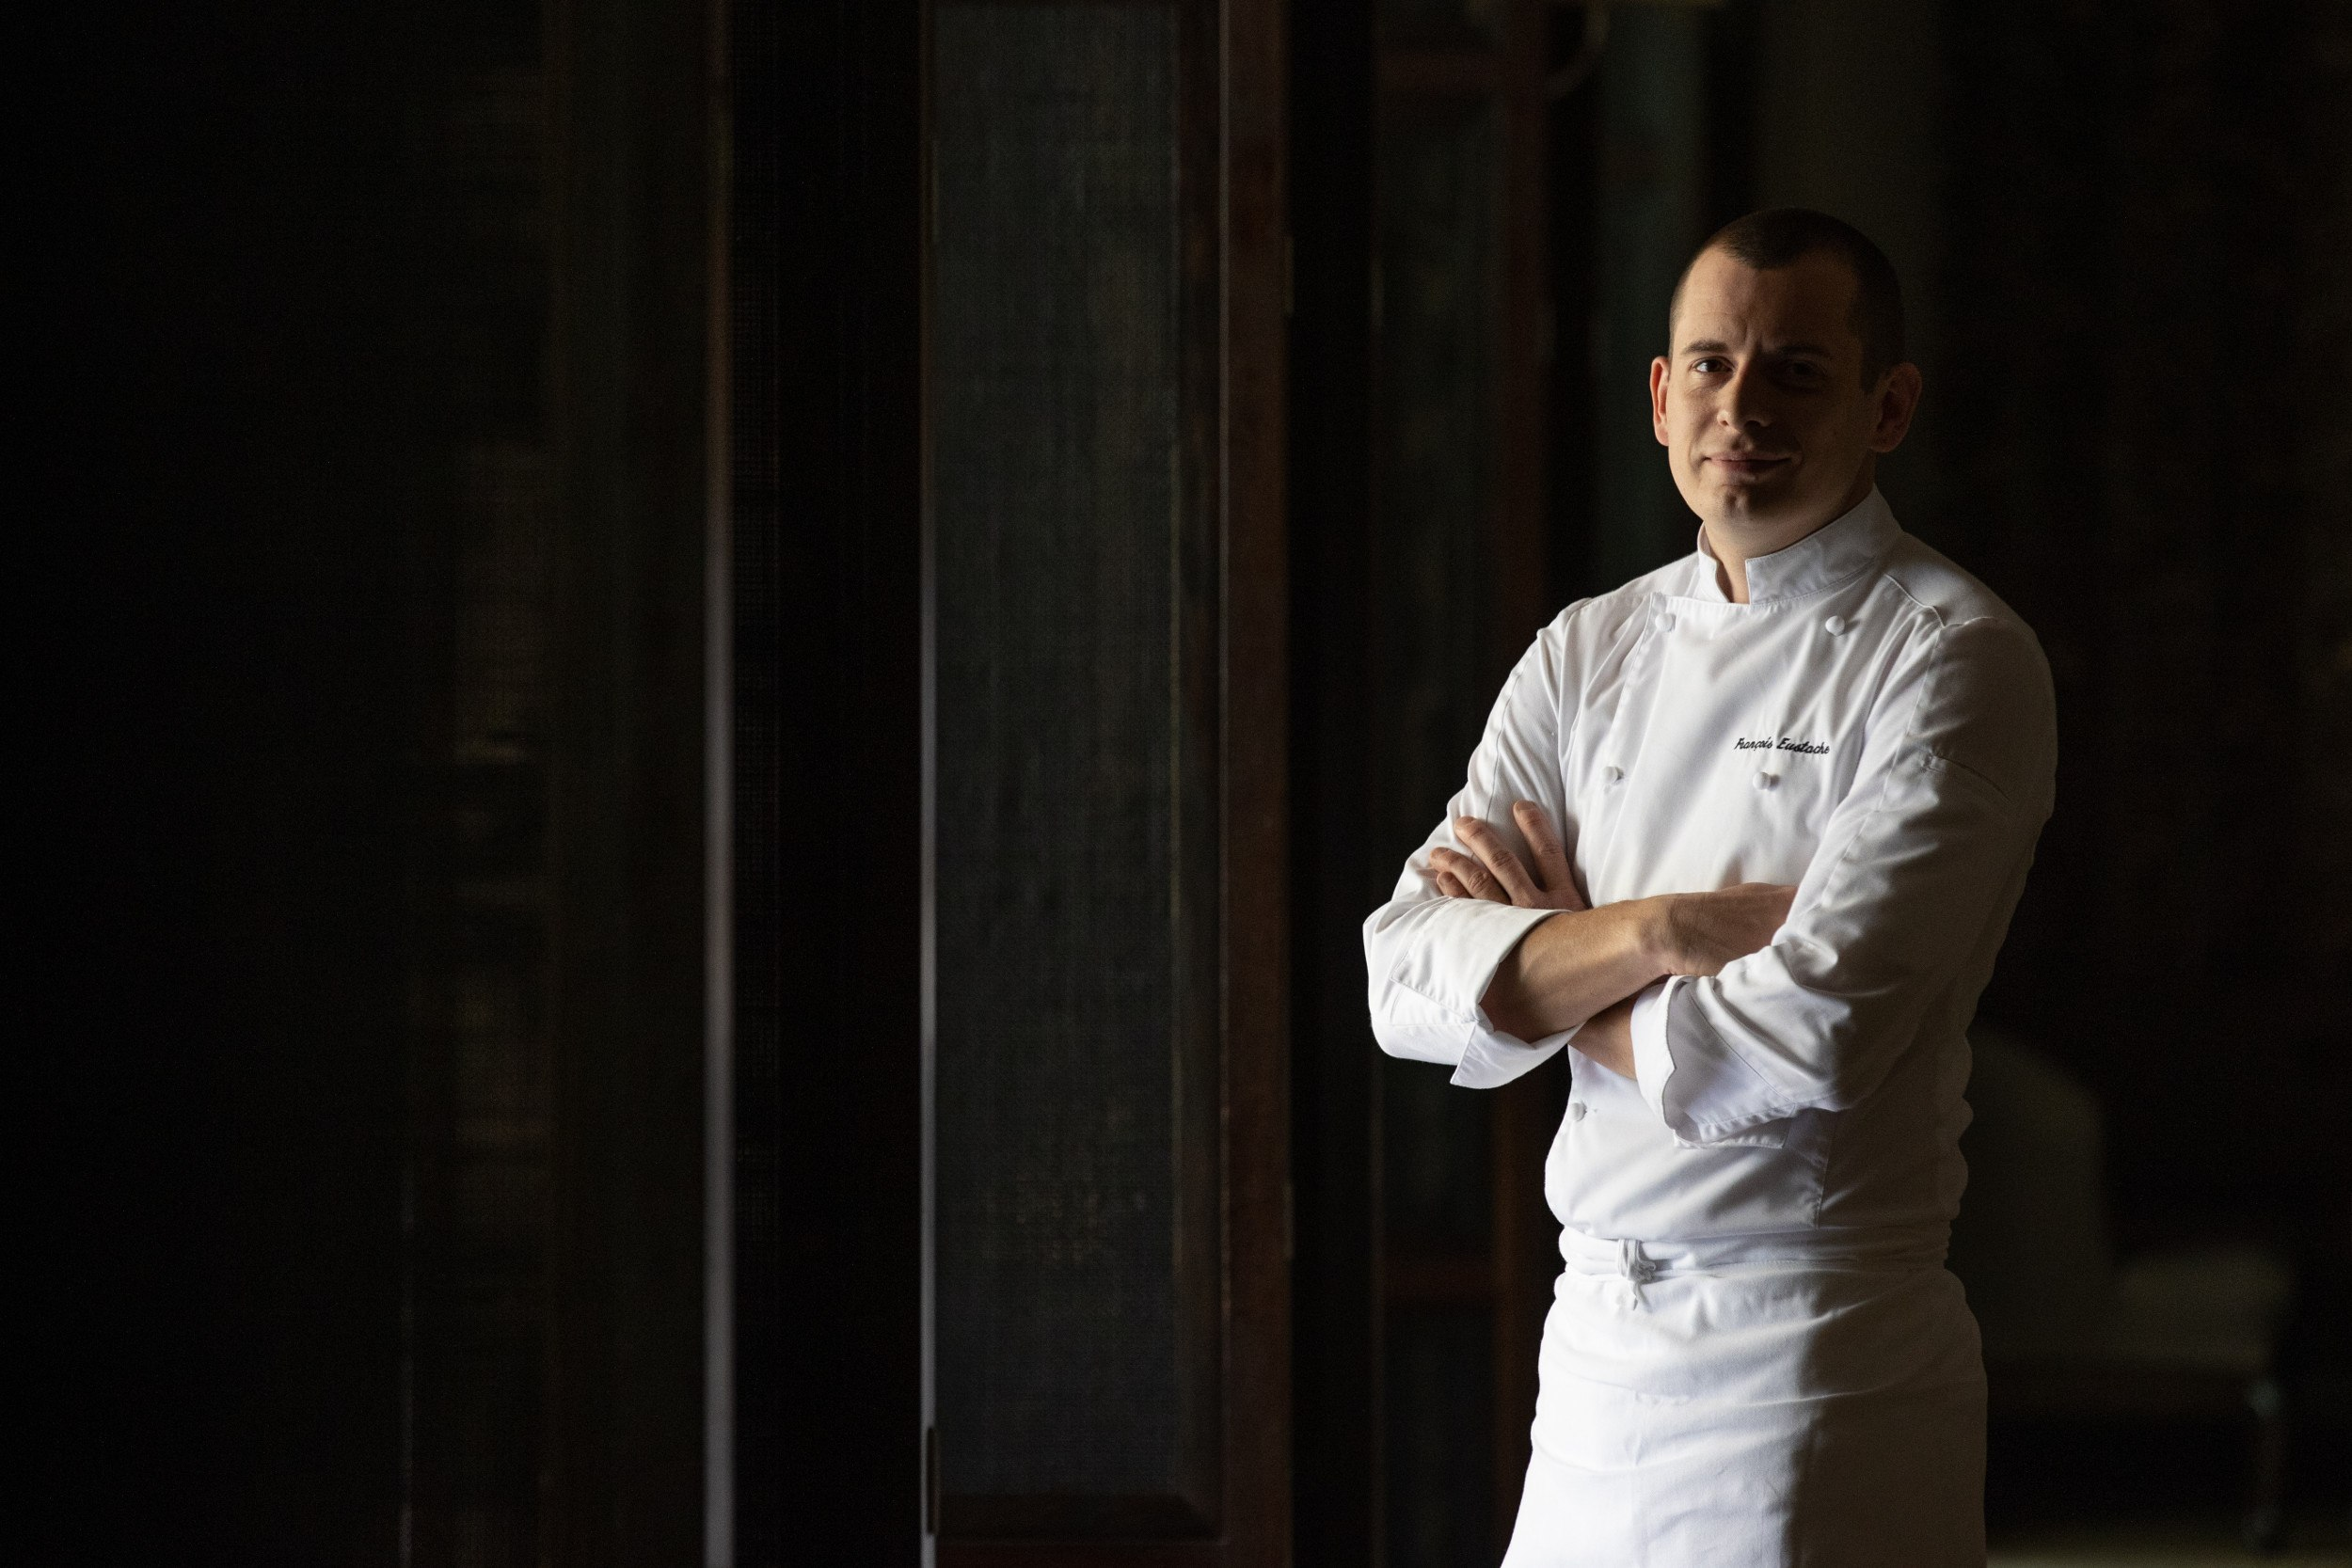 InterContinental-Geneva-Hotel-Woods-restaurant-chef-1